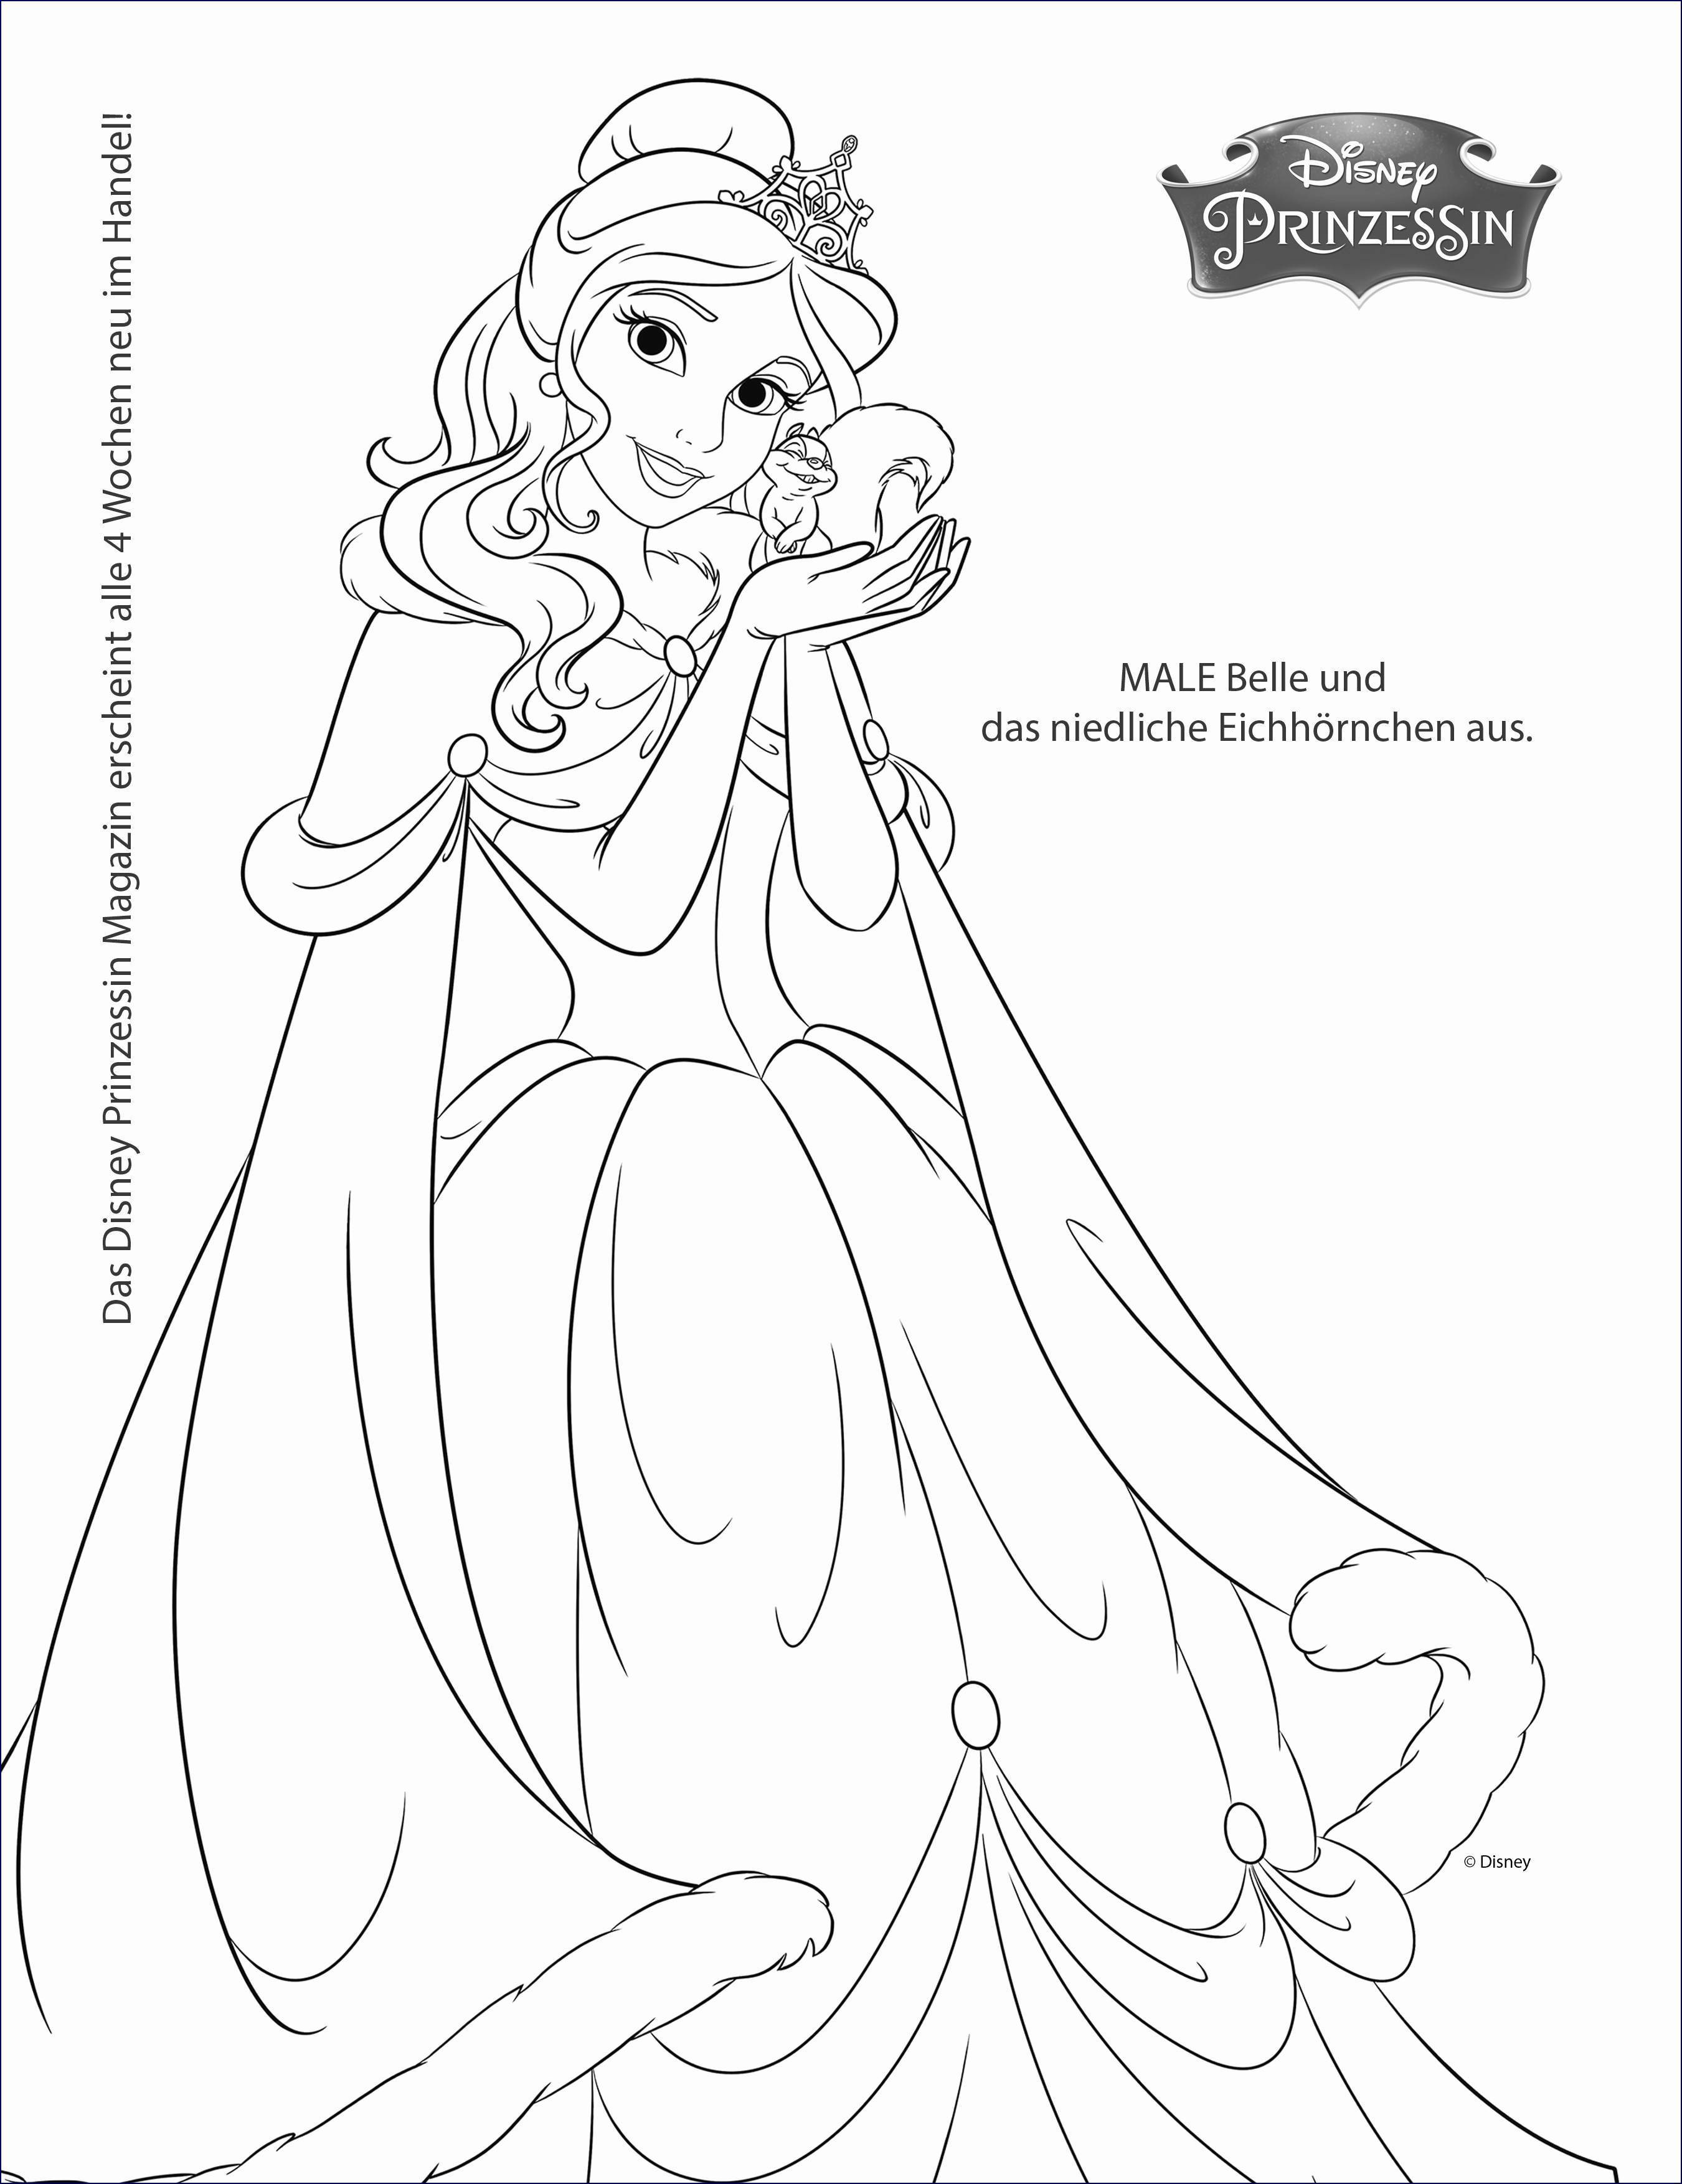 Ausmalbilder Prinzessin Feen Neu Abcpics – Page 8 Nkde Galerie